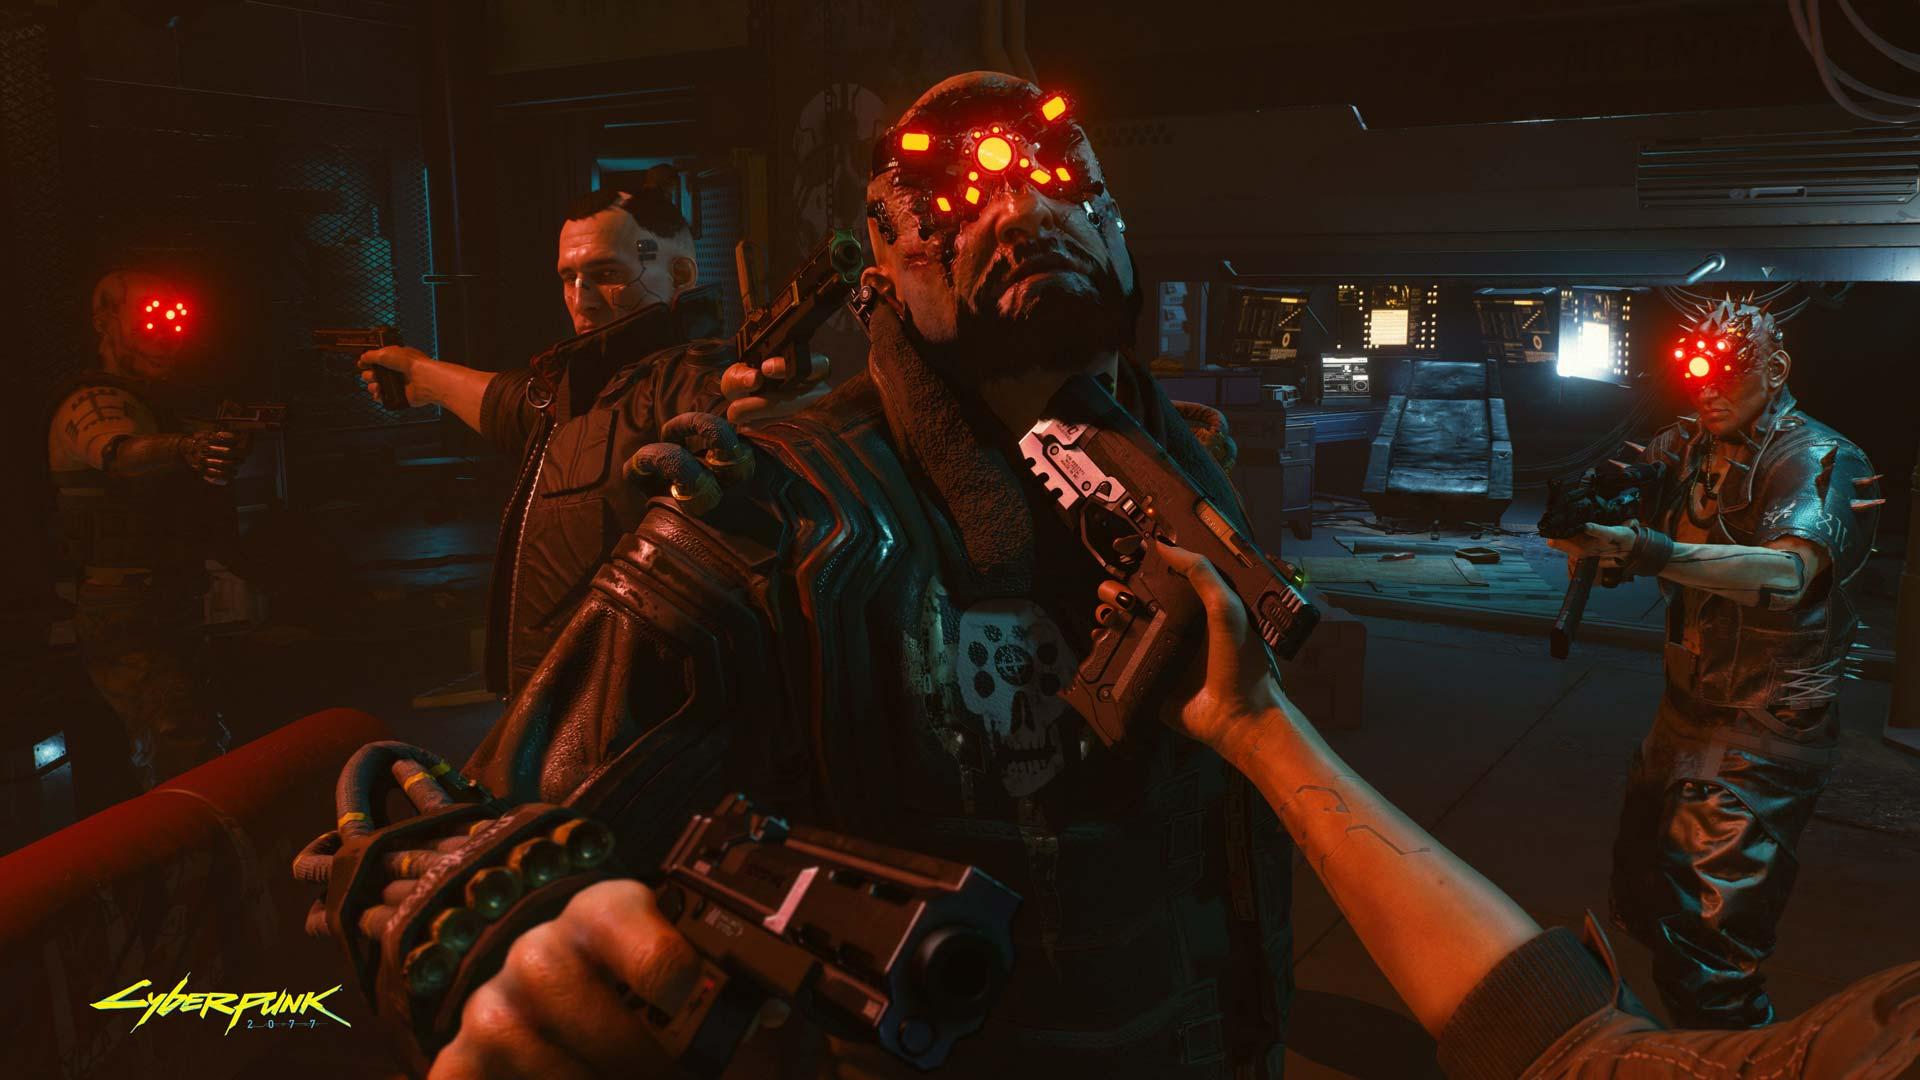 Cyberpunk 2077: Gunpoint